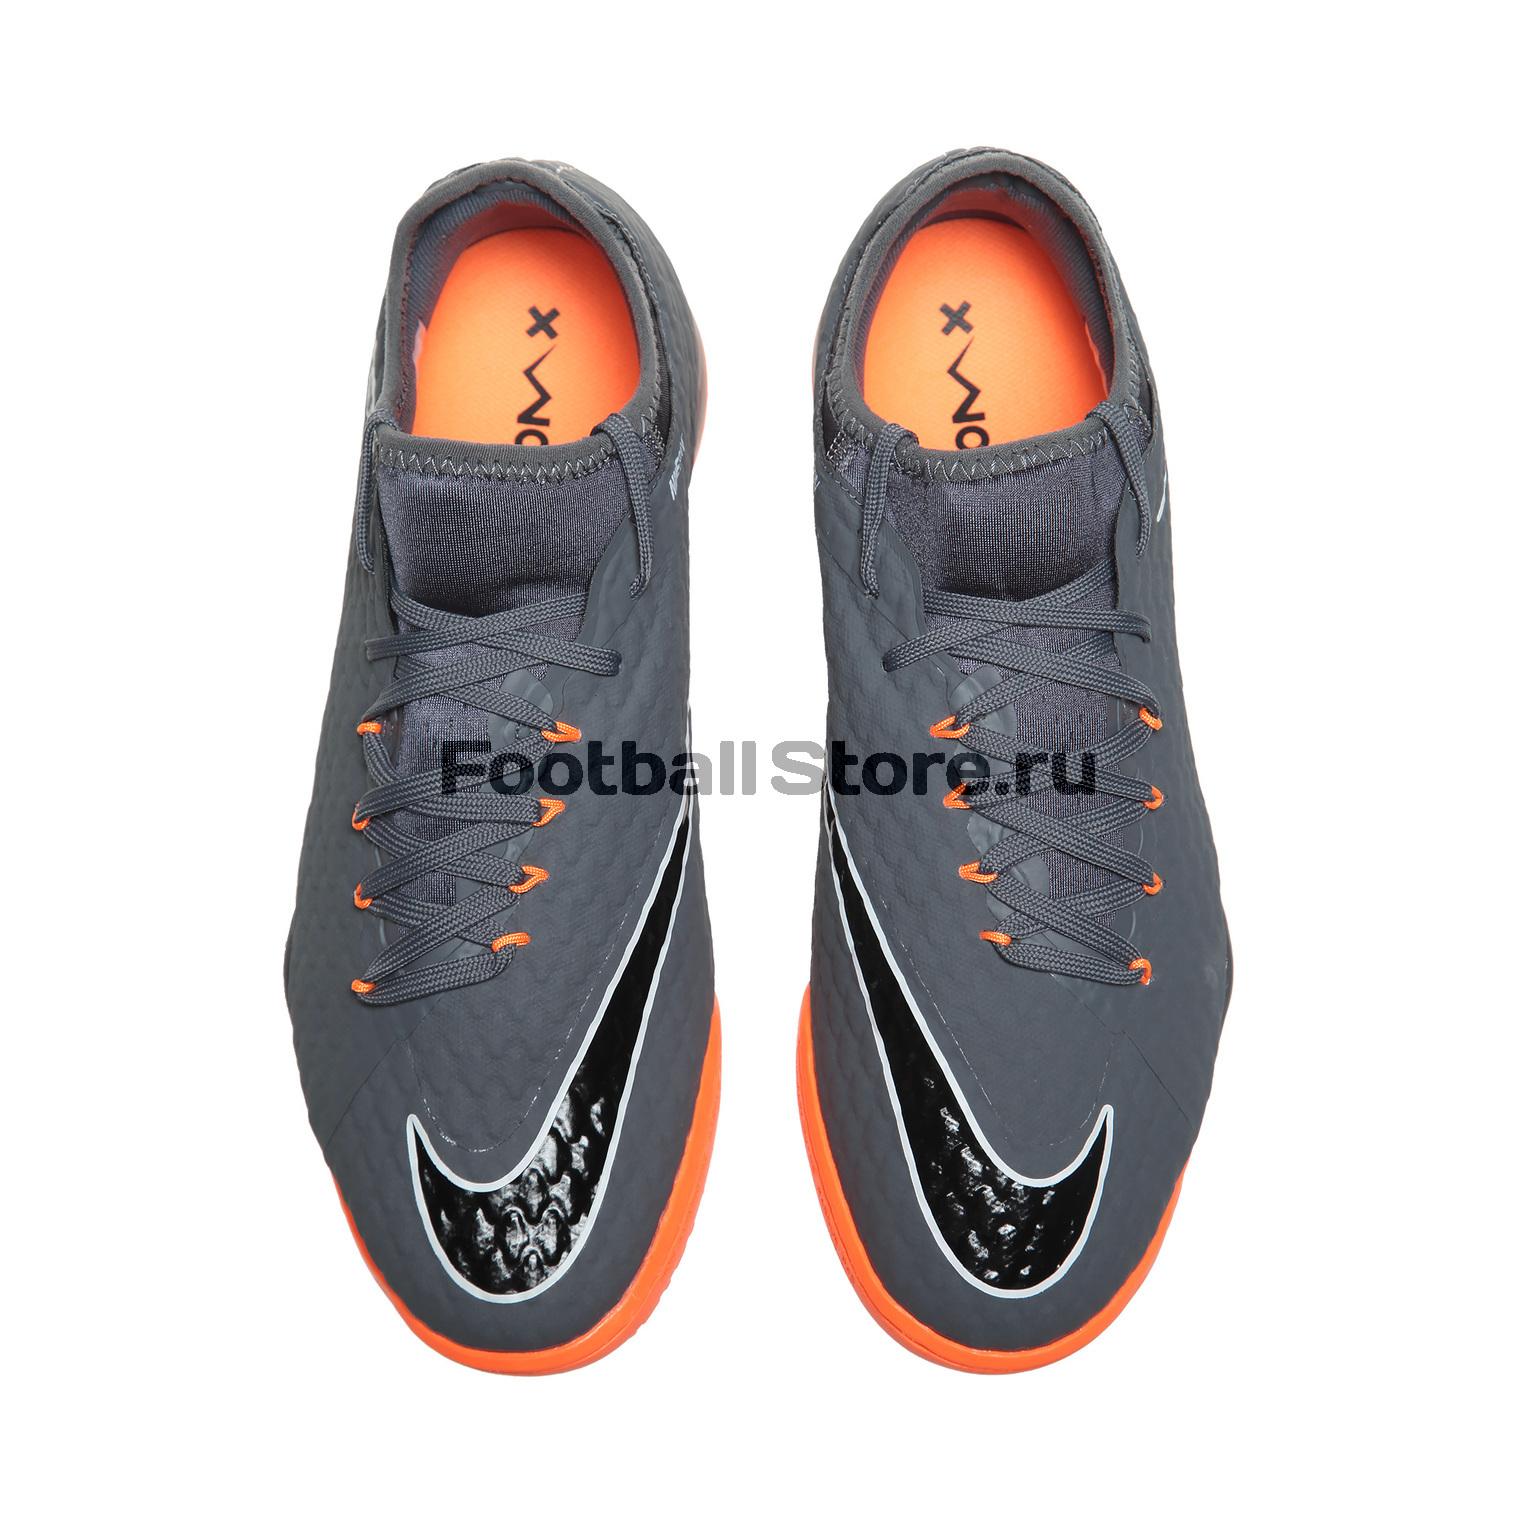 11c5164fc4798c ... Обувь для зала · Nike; Футзалки Nike Zoom PhantomX 3 Pro IC AH7282-081.  Скидка